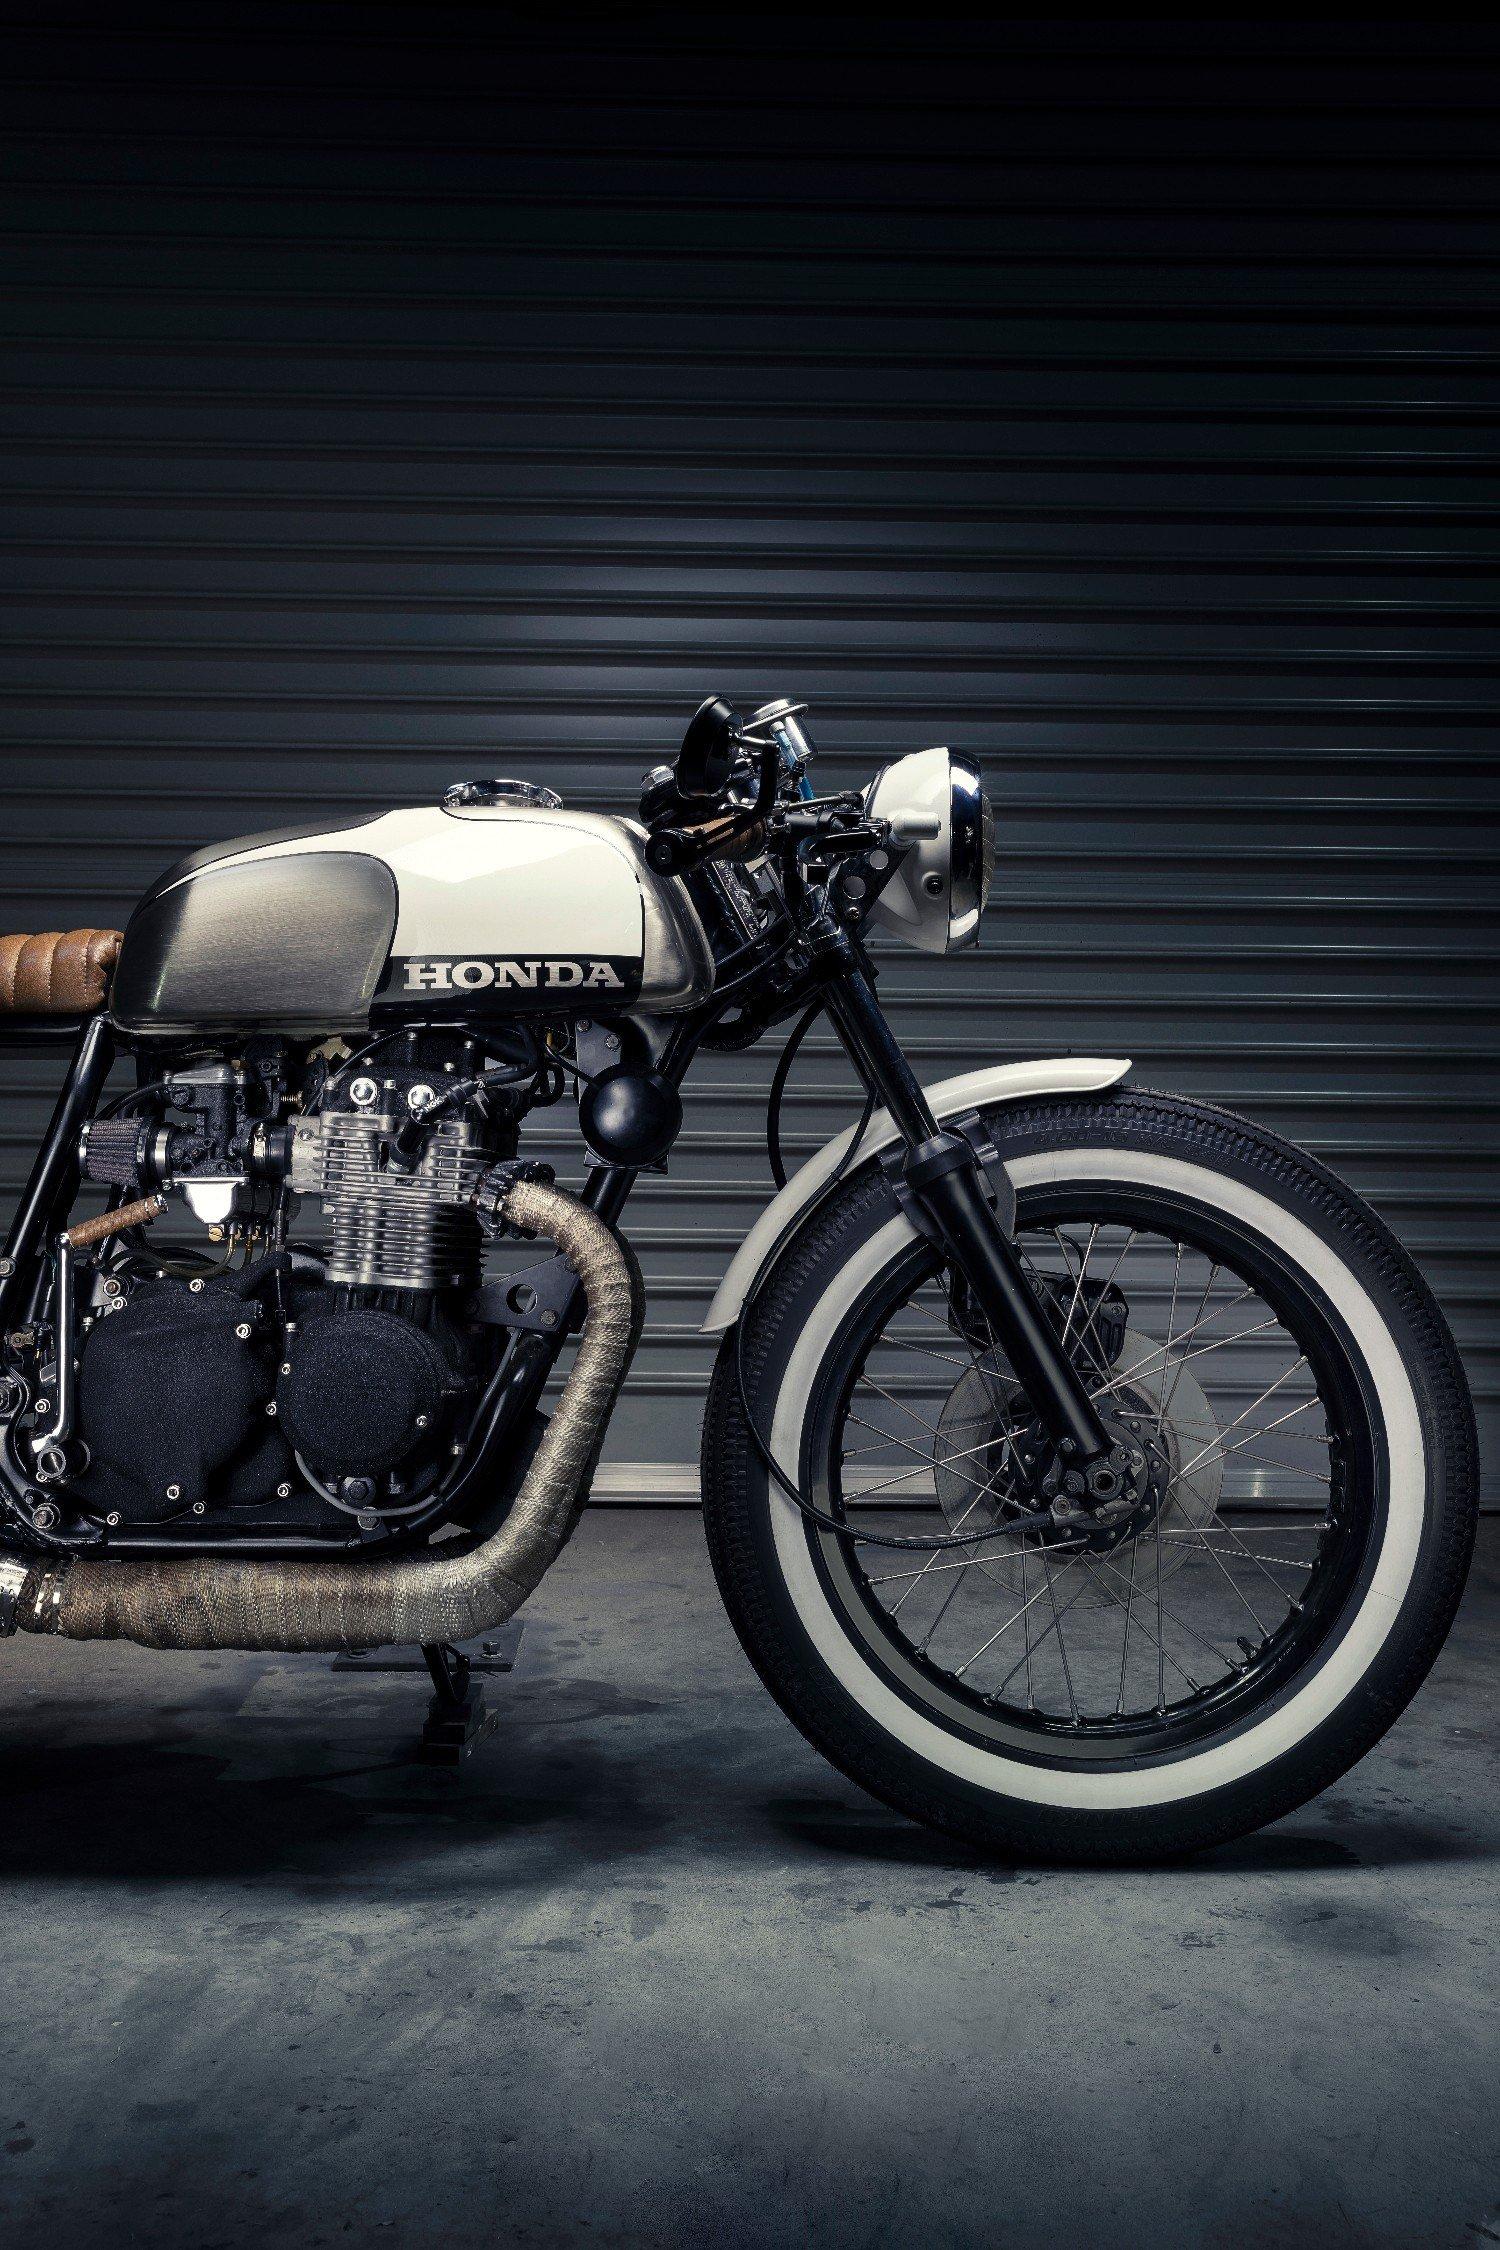 custom honda accessories and parts Cafe Racer Australia Hand made machines